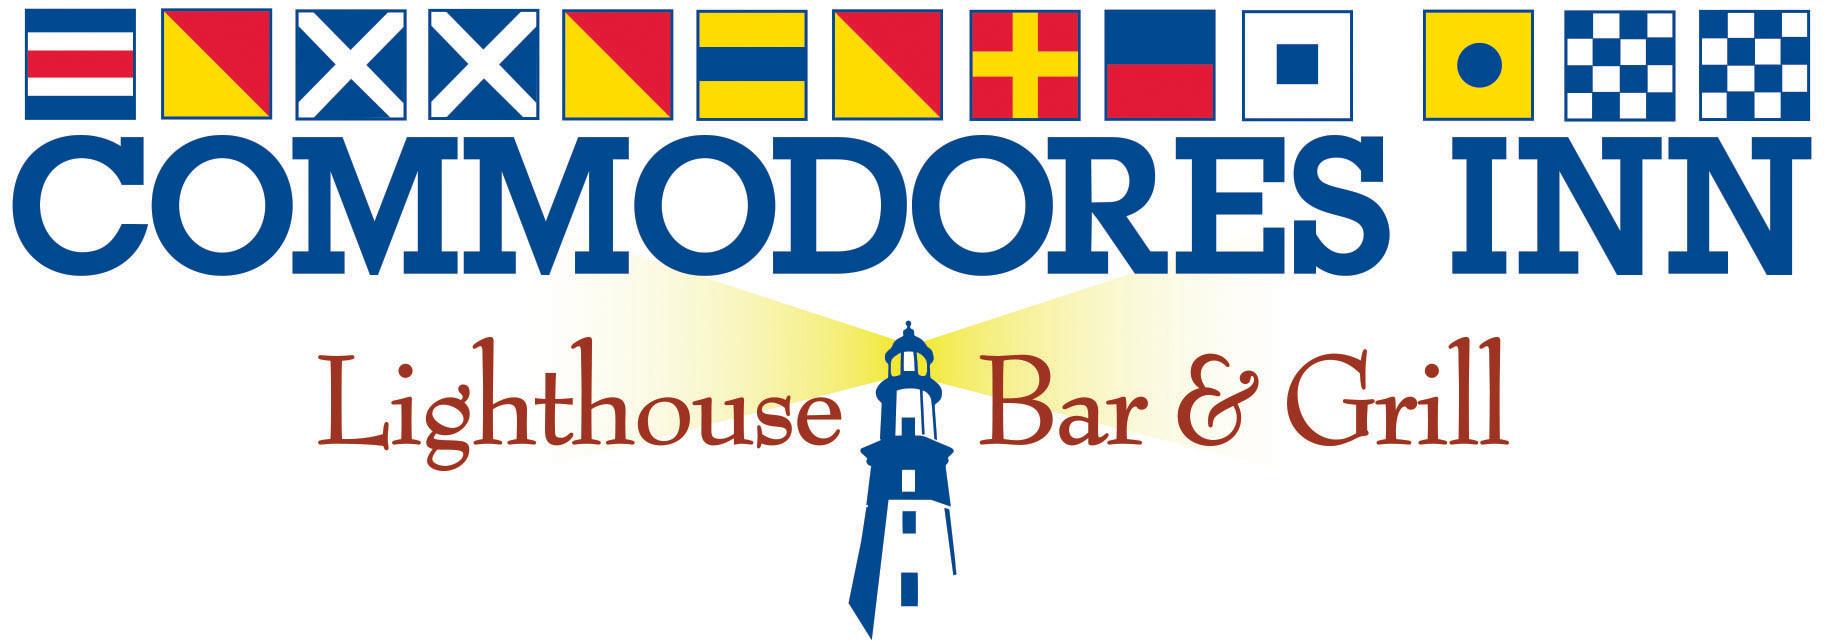 Commodores-lighthouse logo darker blue.jpg